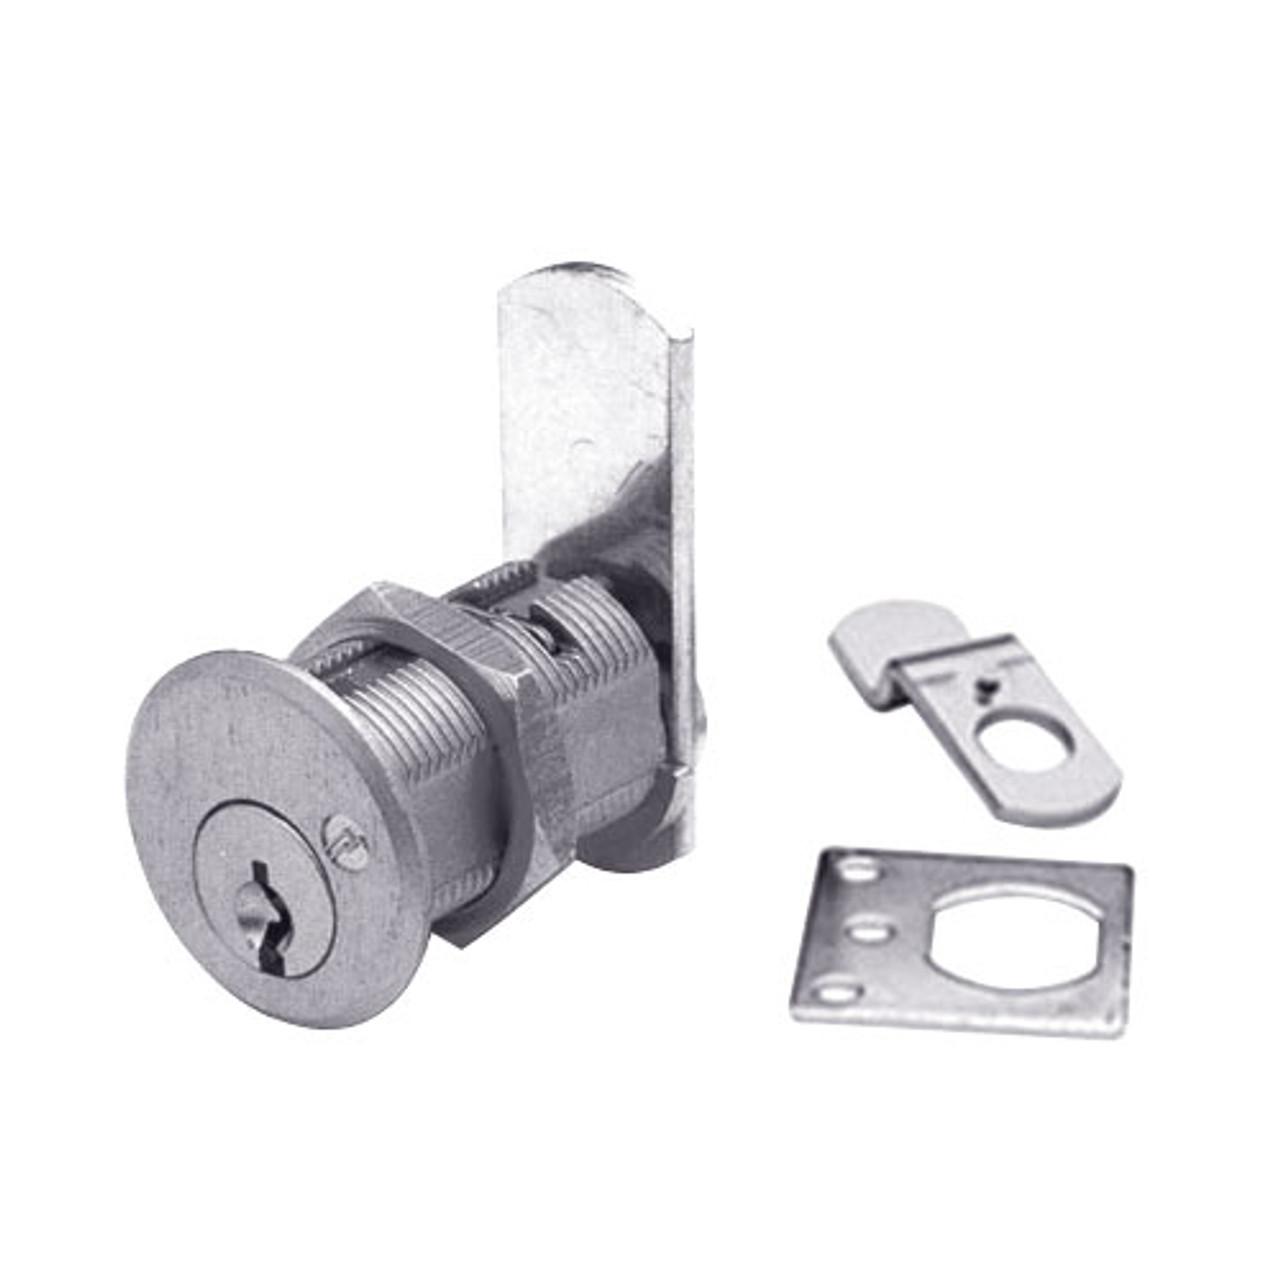 Olympus DCN1-KA101-26D Cam Locks in Satin Chrome Finish